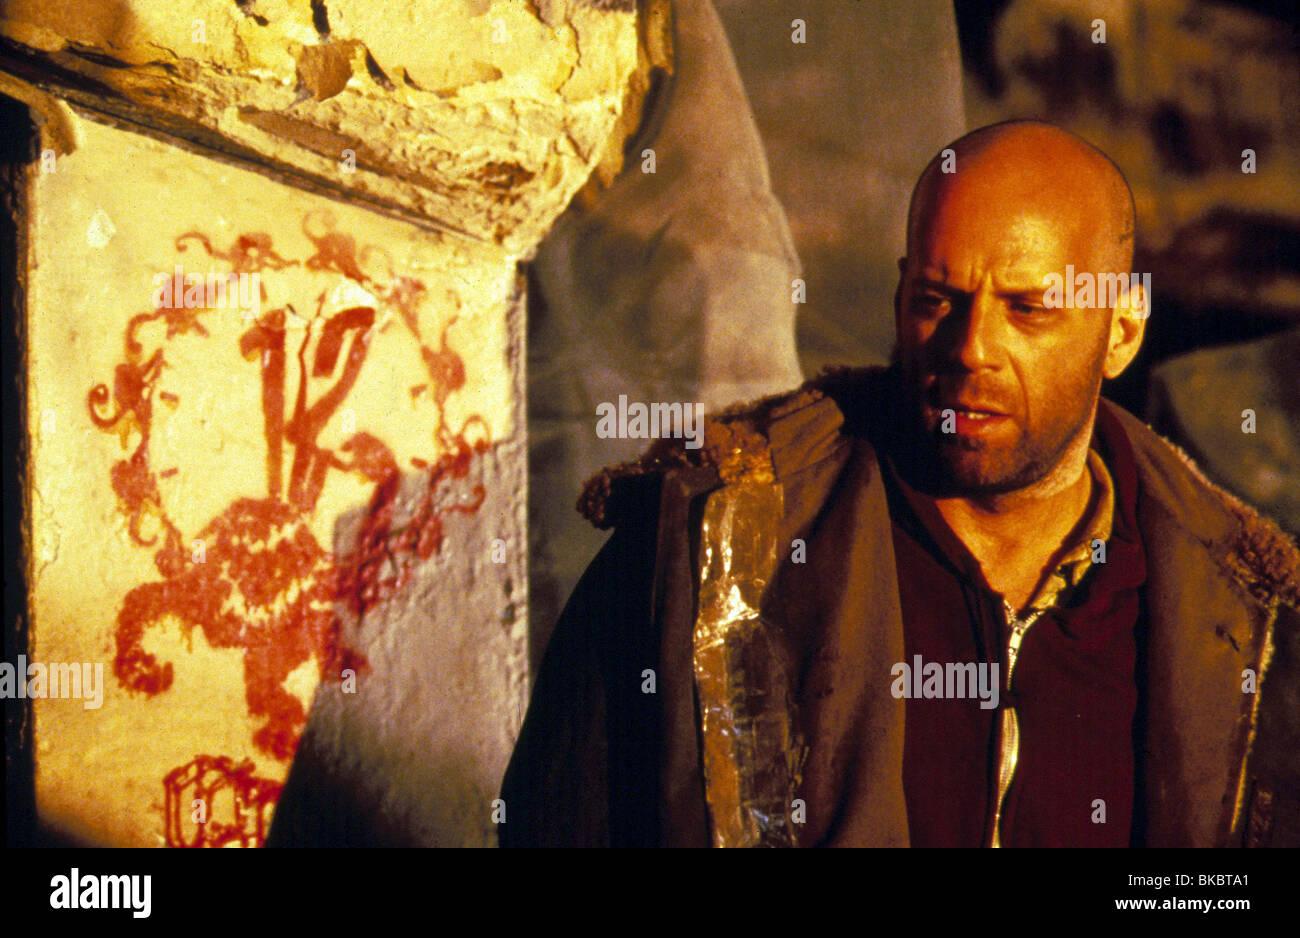 Douze singes (1995) BRUCE WILLIS TVMK 097 Photo Stock